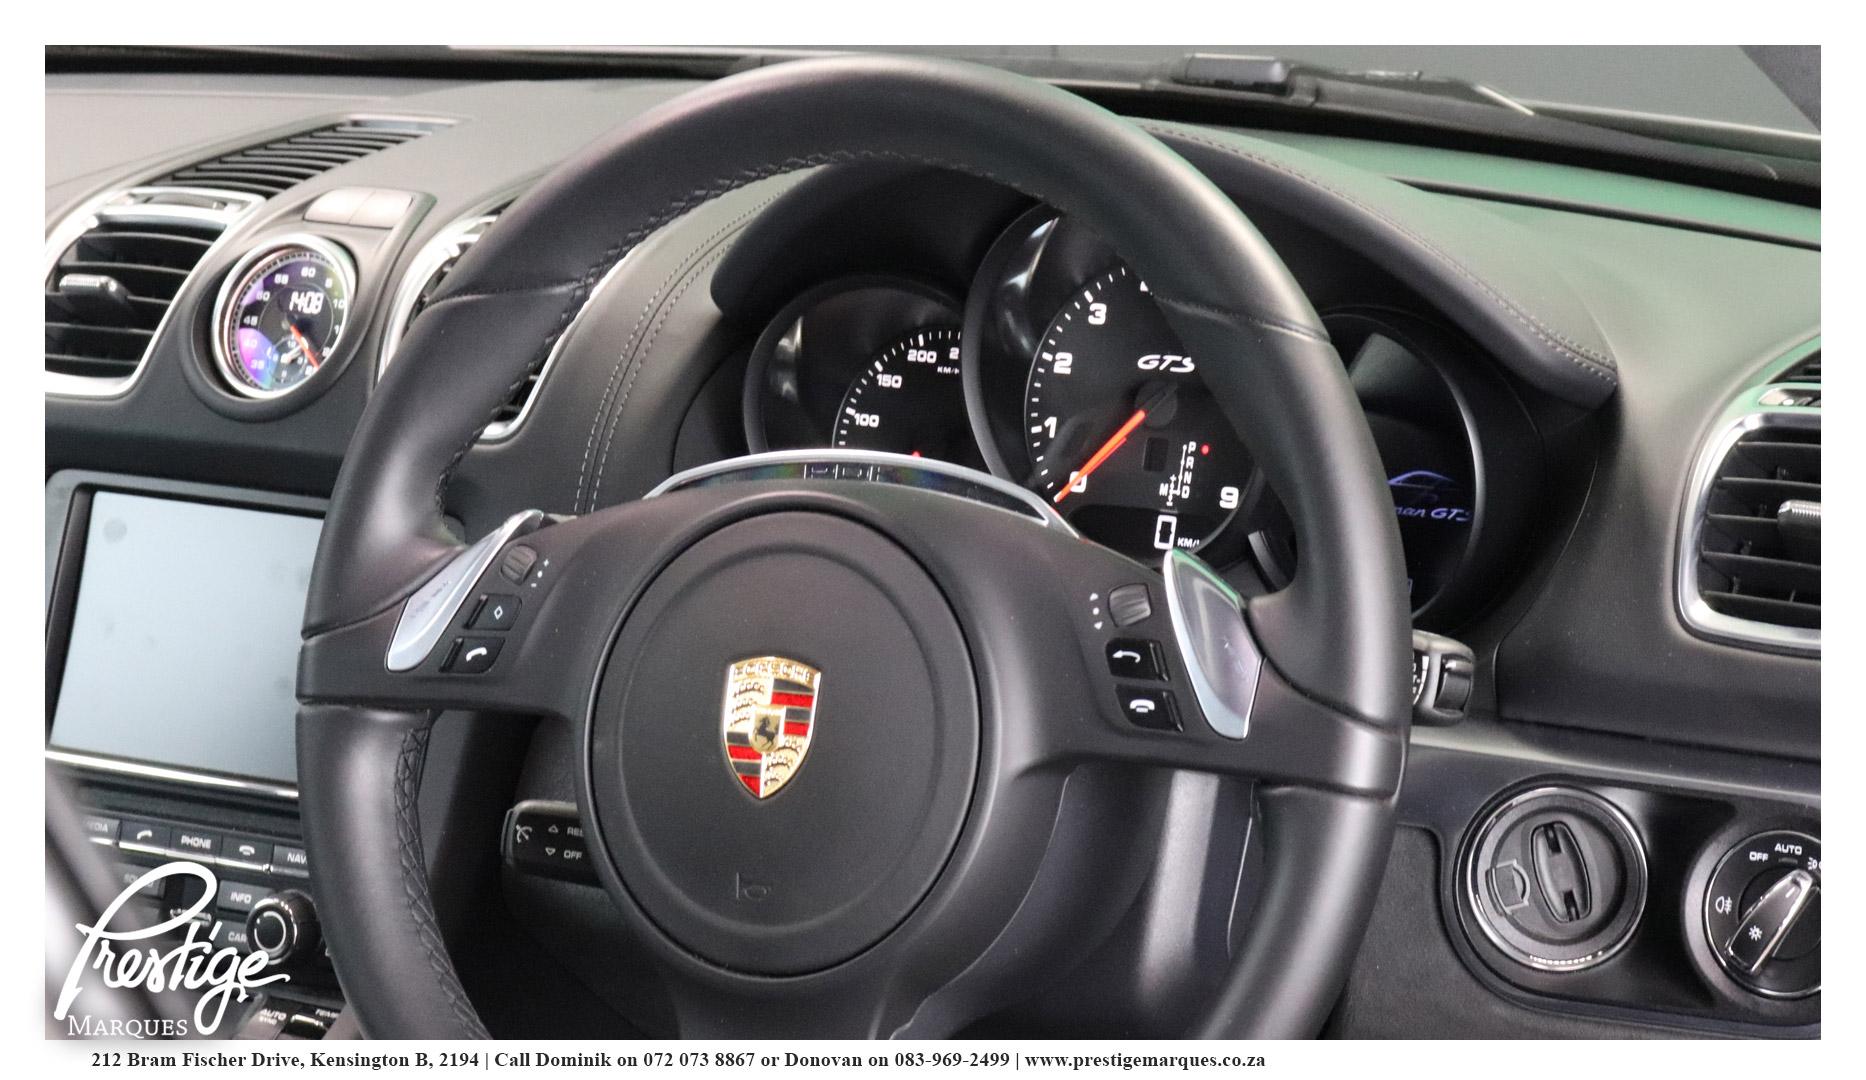 2015-Porsche-Cayman-GTS PDK-Prestige-Marques-Randburg-Sandton-14